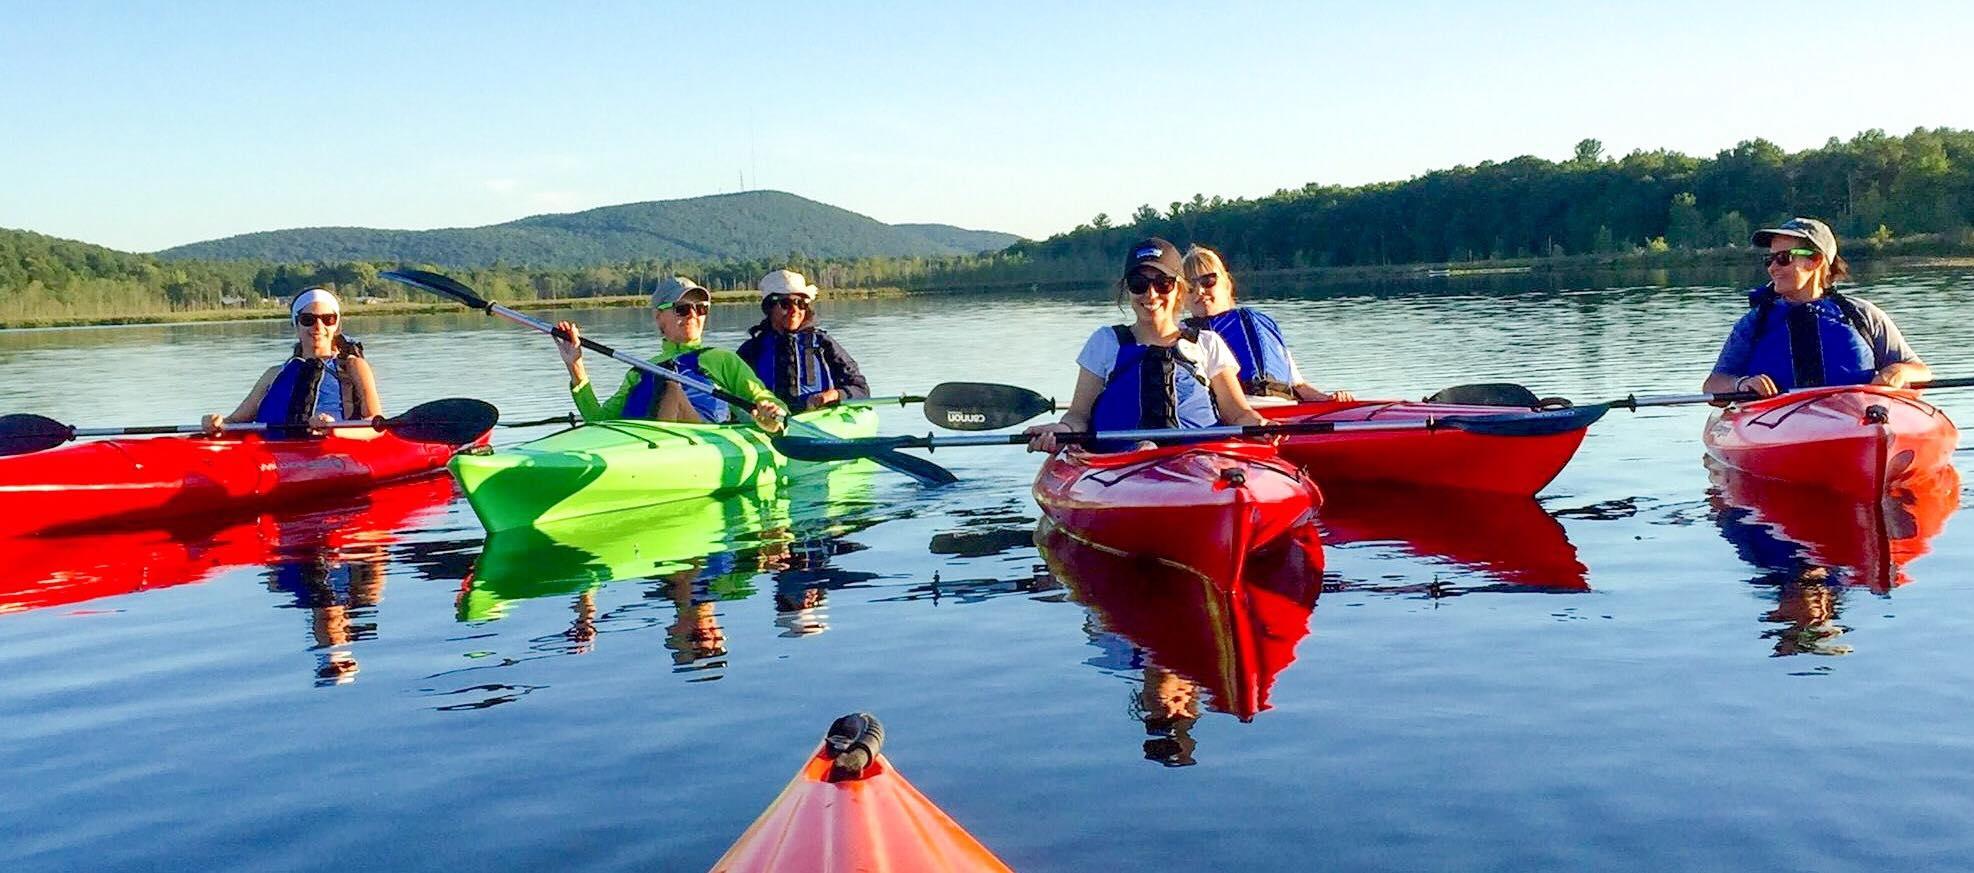 Rental Kayak Equipment